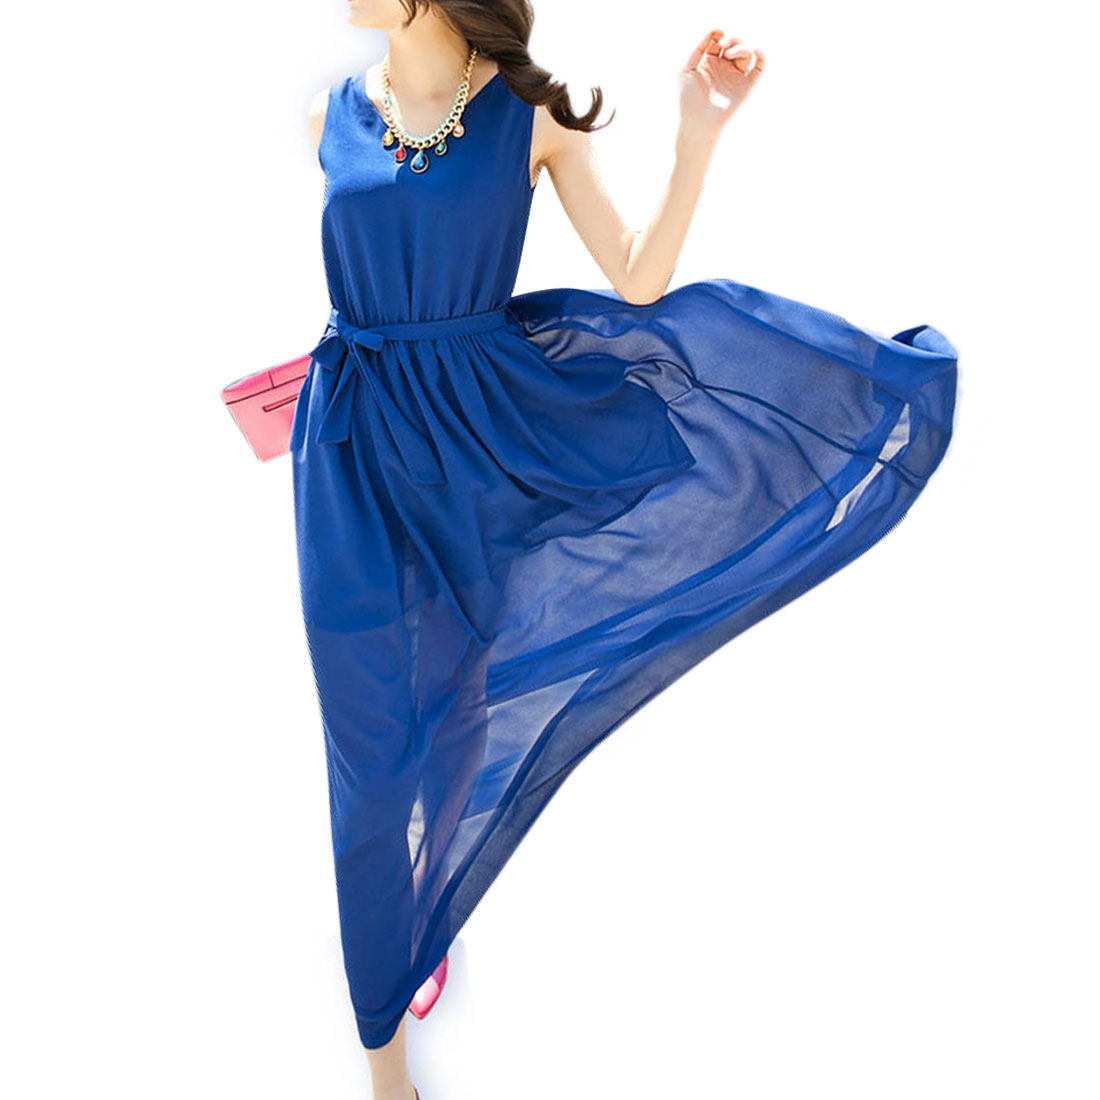 Lady Blue V Neck Sleeveless Elastic Waist Slant Pocket Dress S